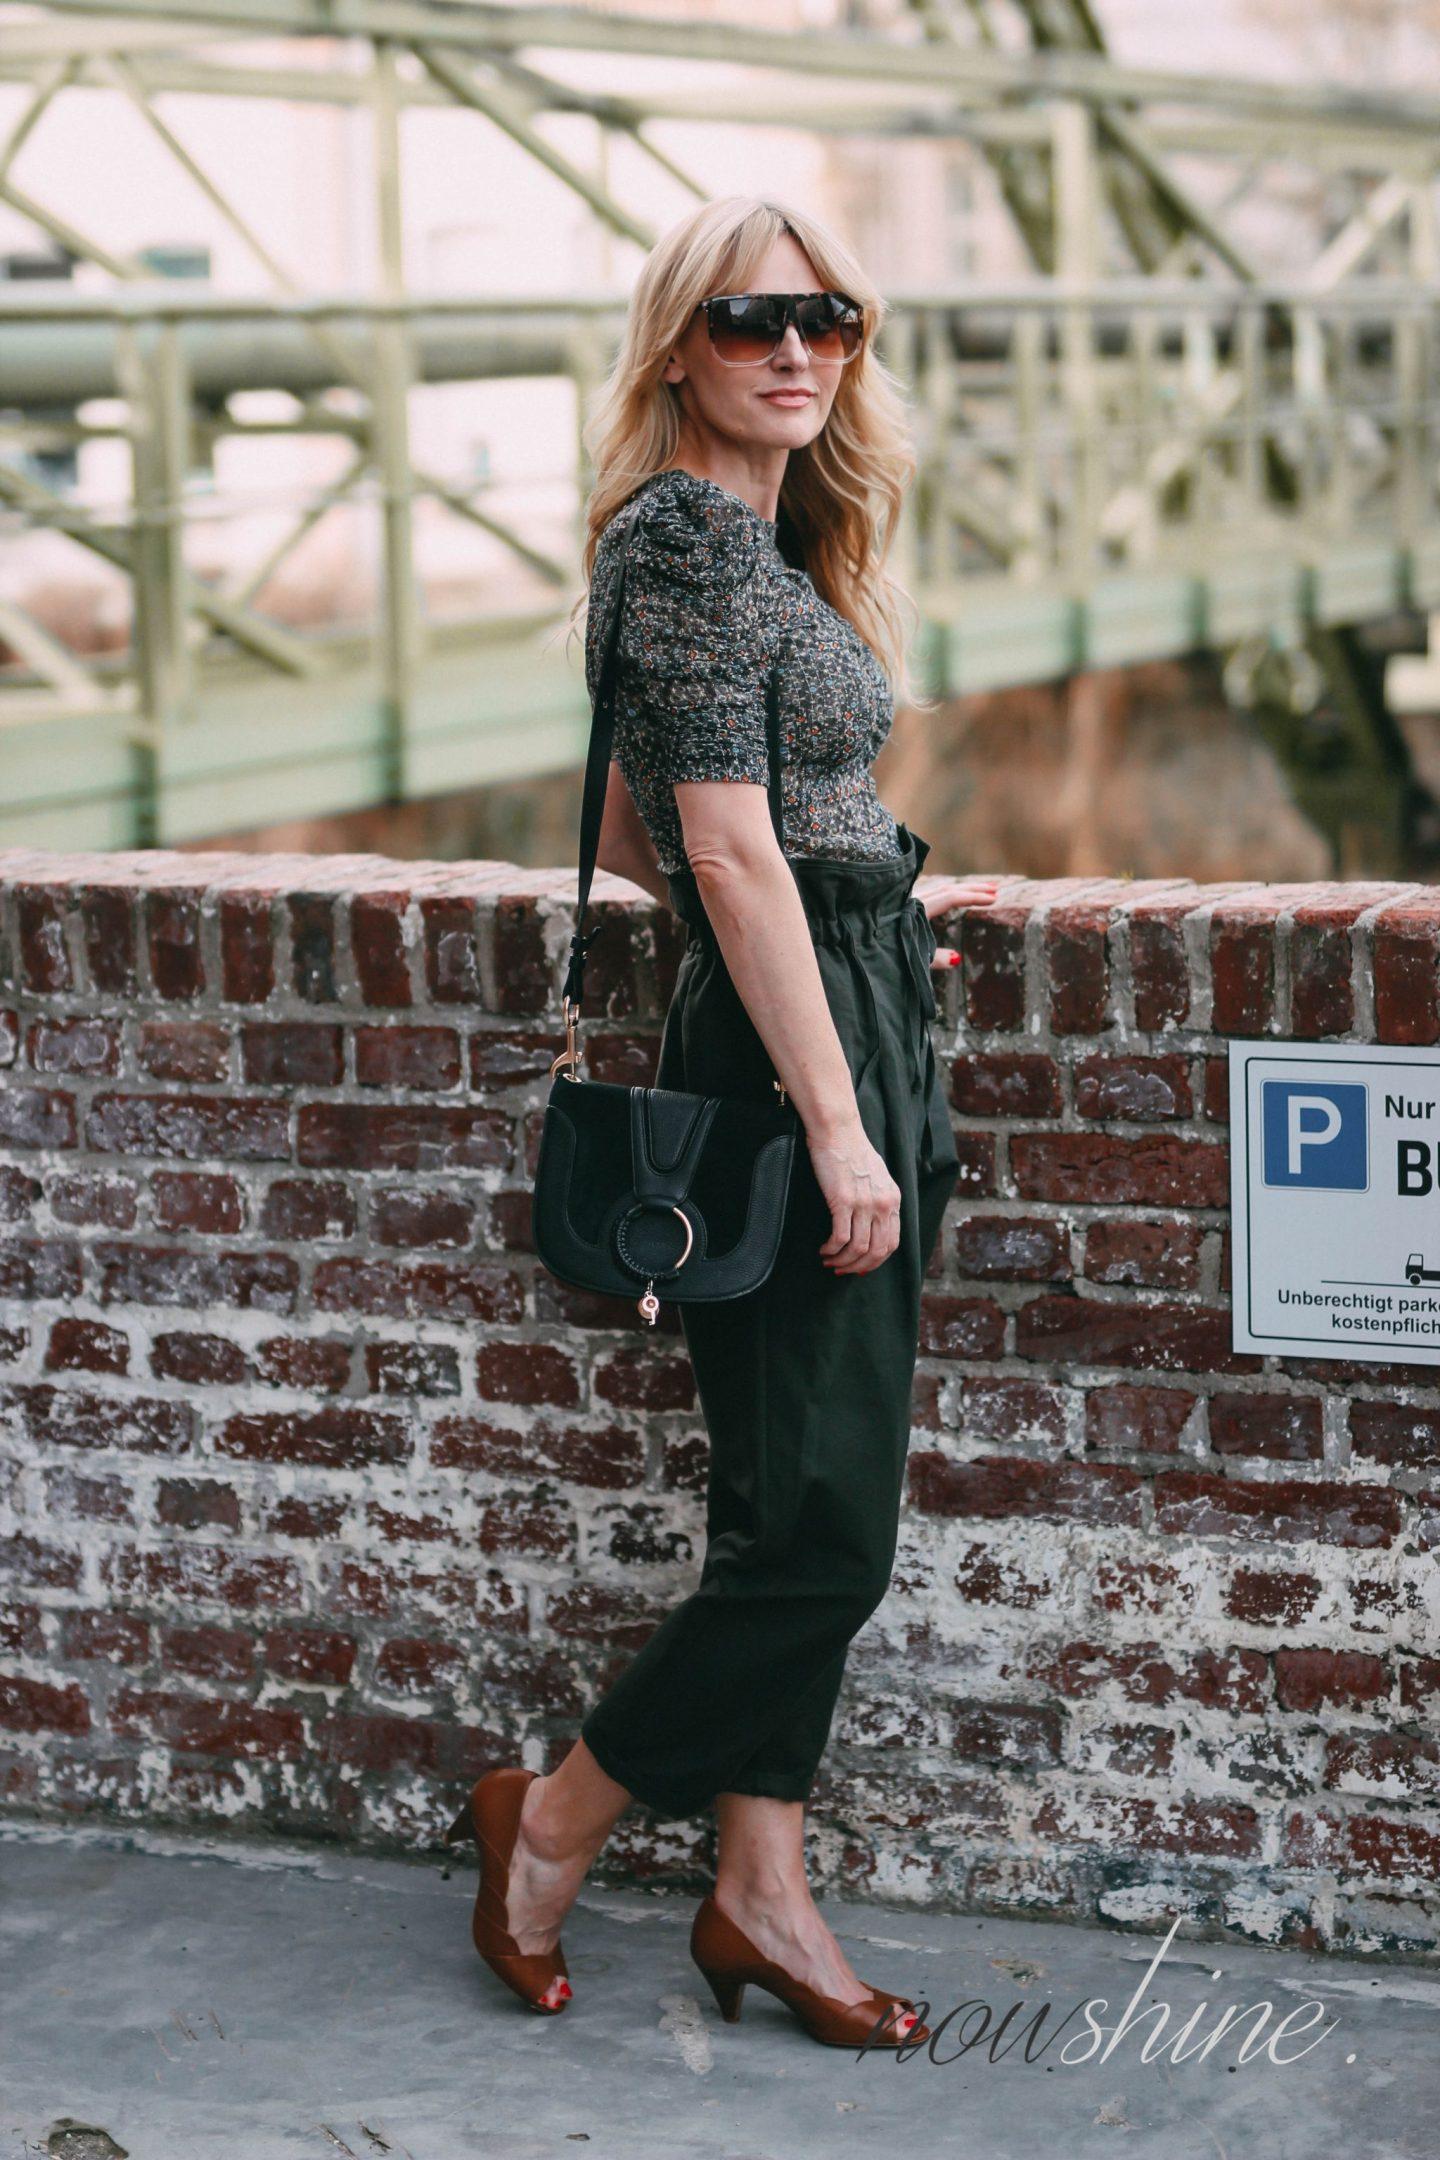 Sézane Onlineshop Erfahrungen - Retouren -Nowshine ü40 Fashion Blog - Schuhe Cognac